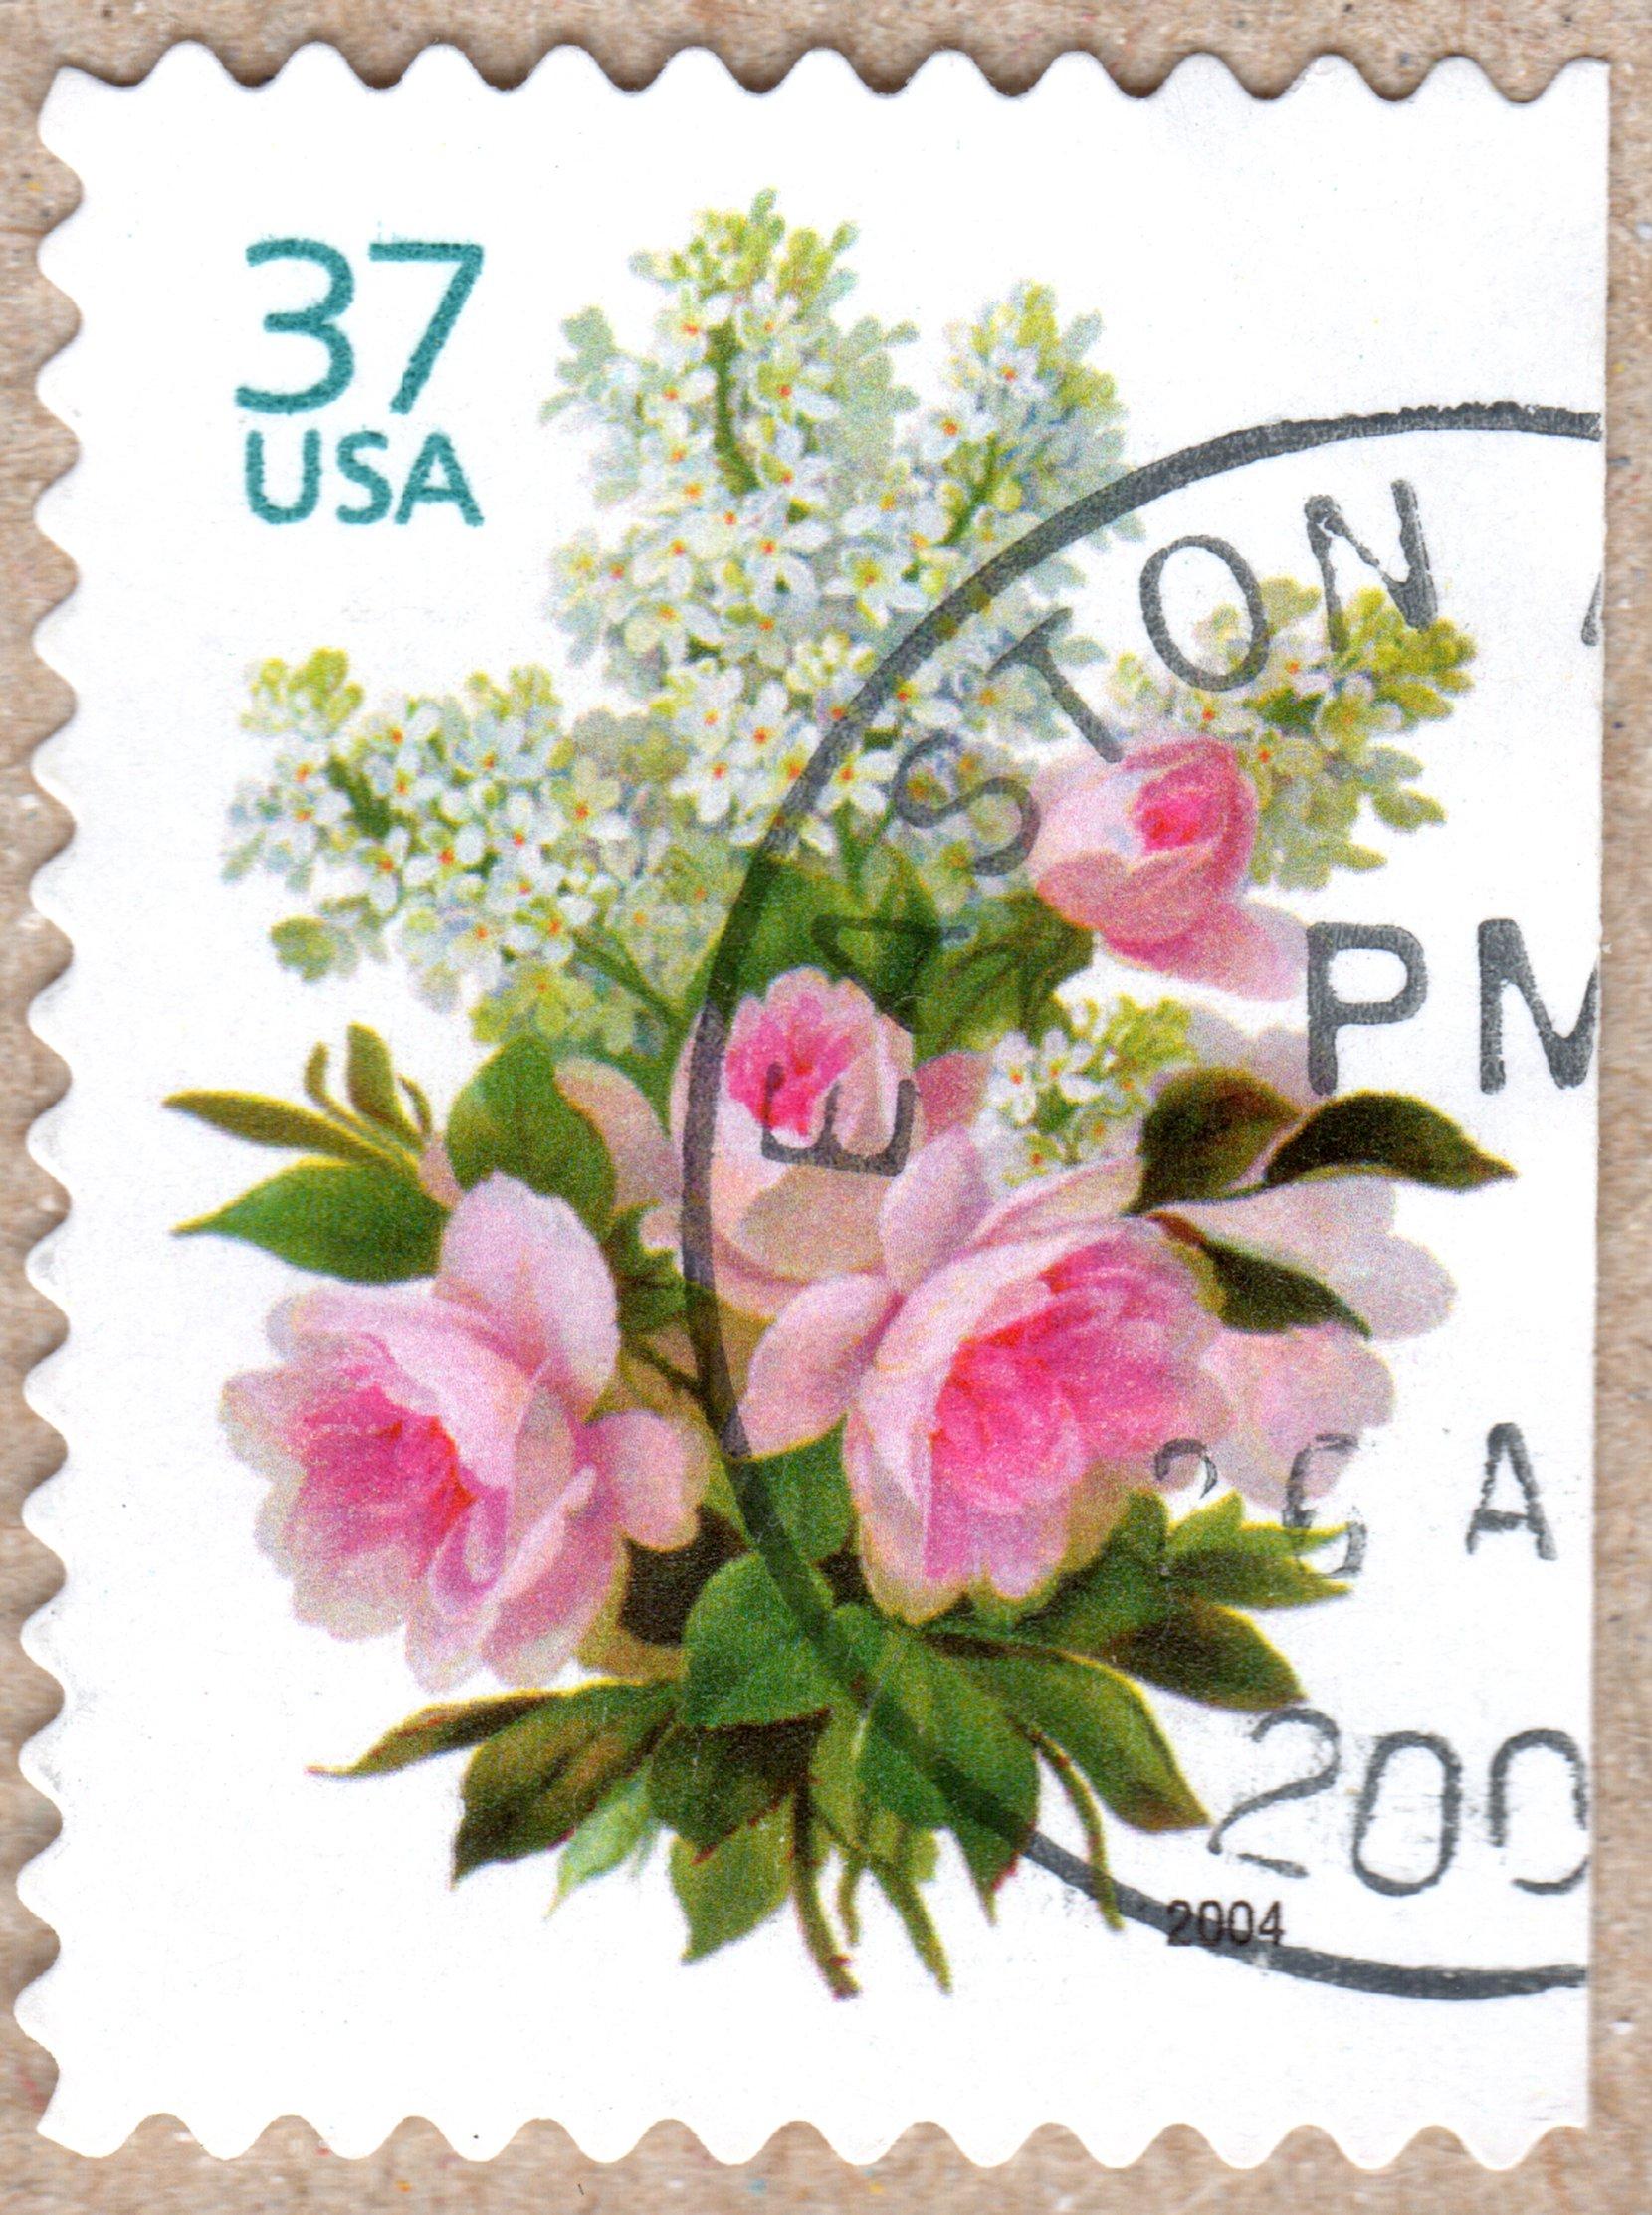 flowers usa 37 ¢ u.s. postage stamp (2004) philately postage stamps